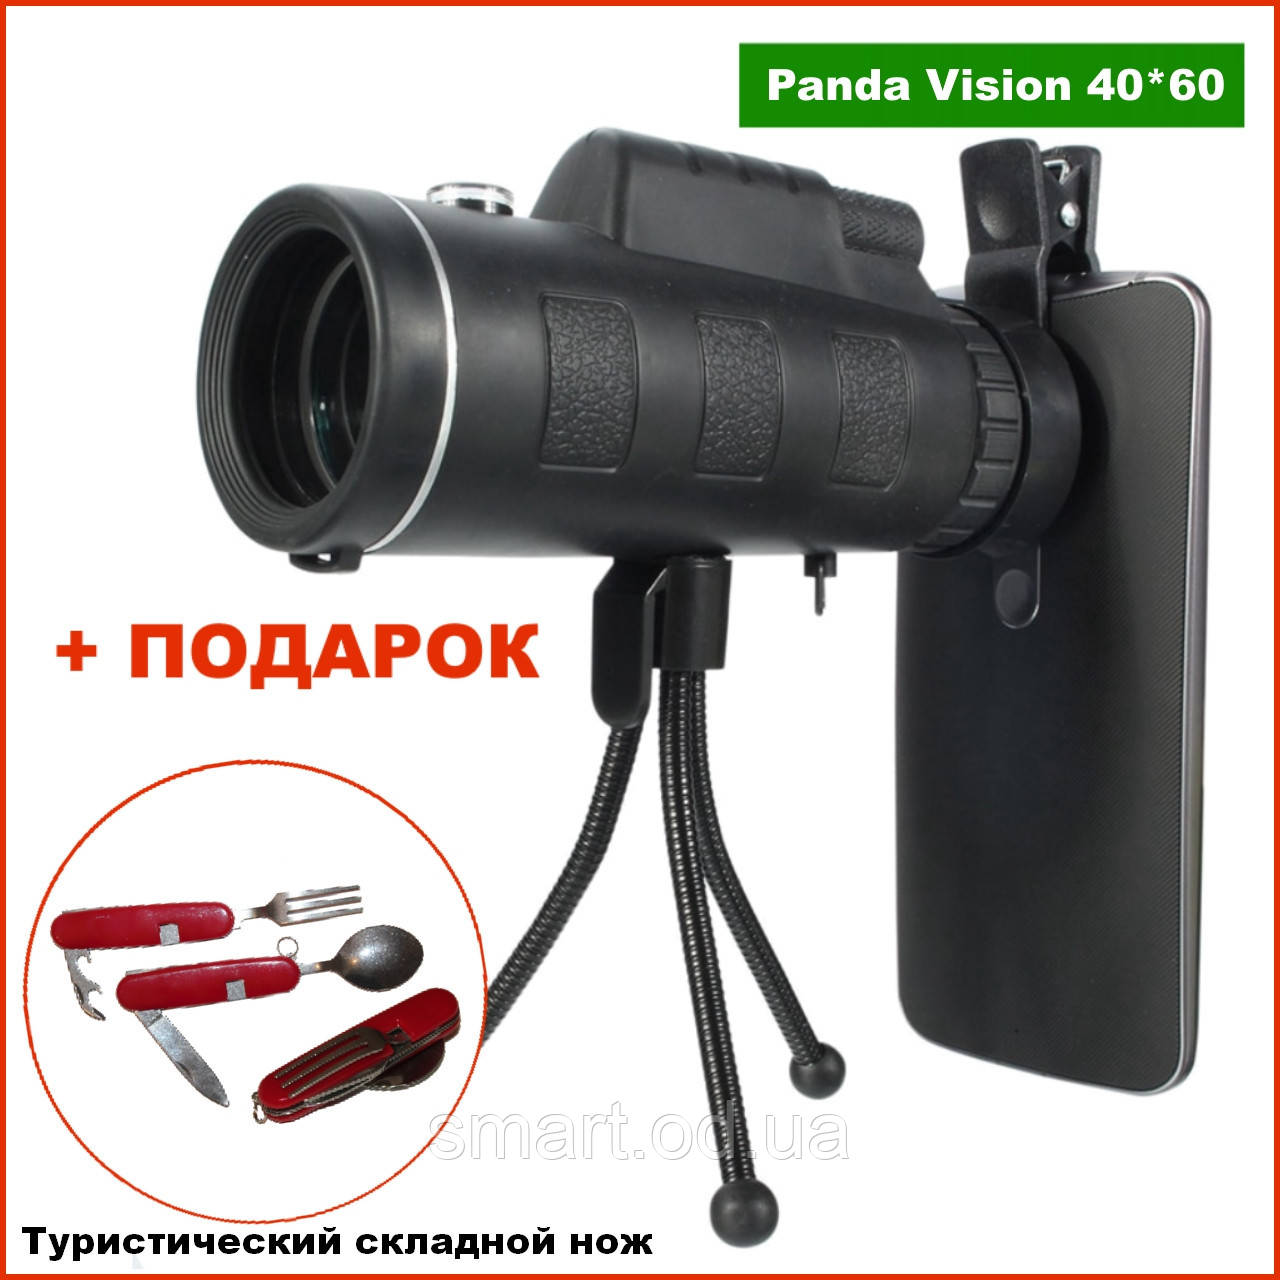 Монокуляр Panda Vision 40 * 60 + ПОДАРУНОК е7517